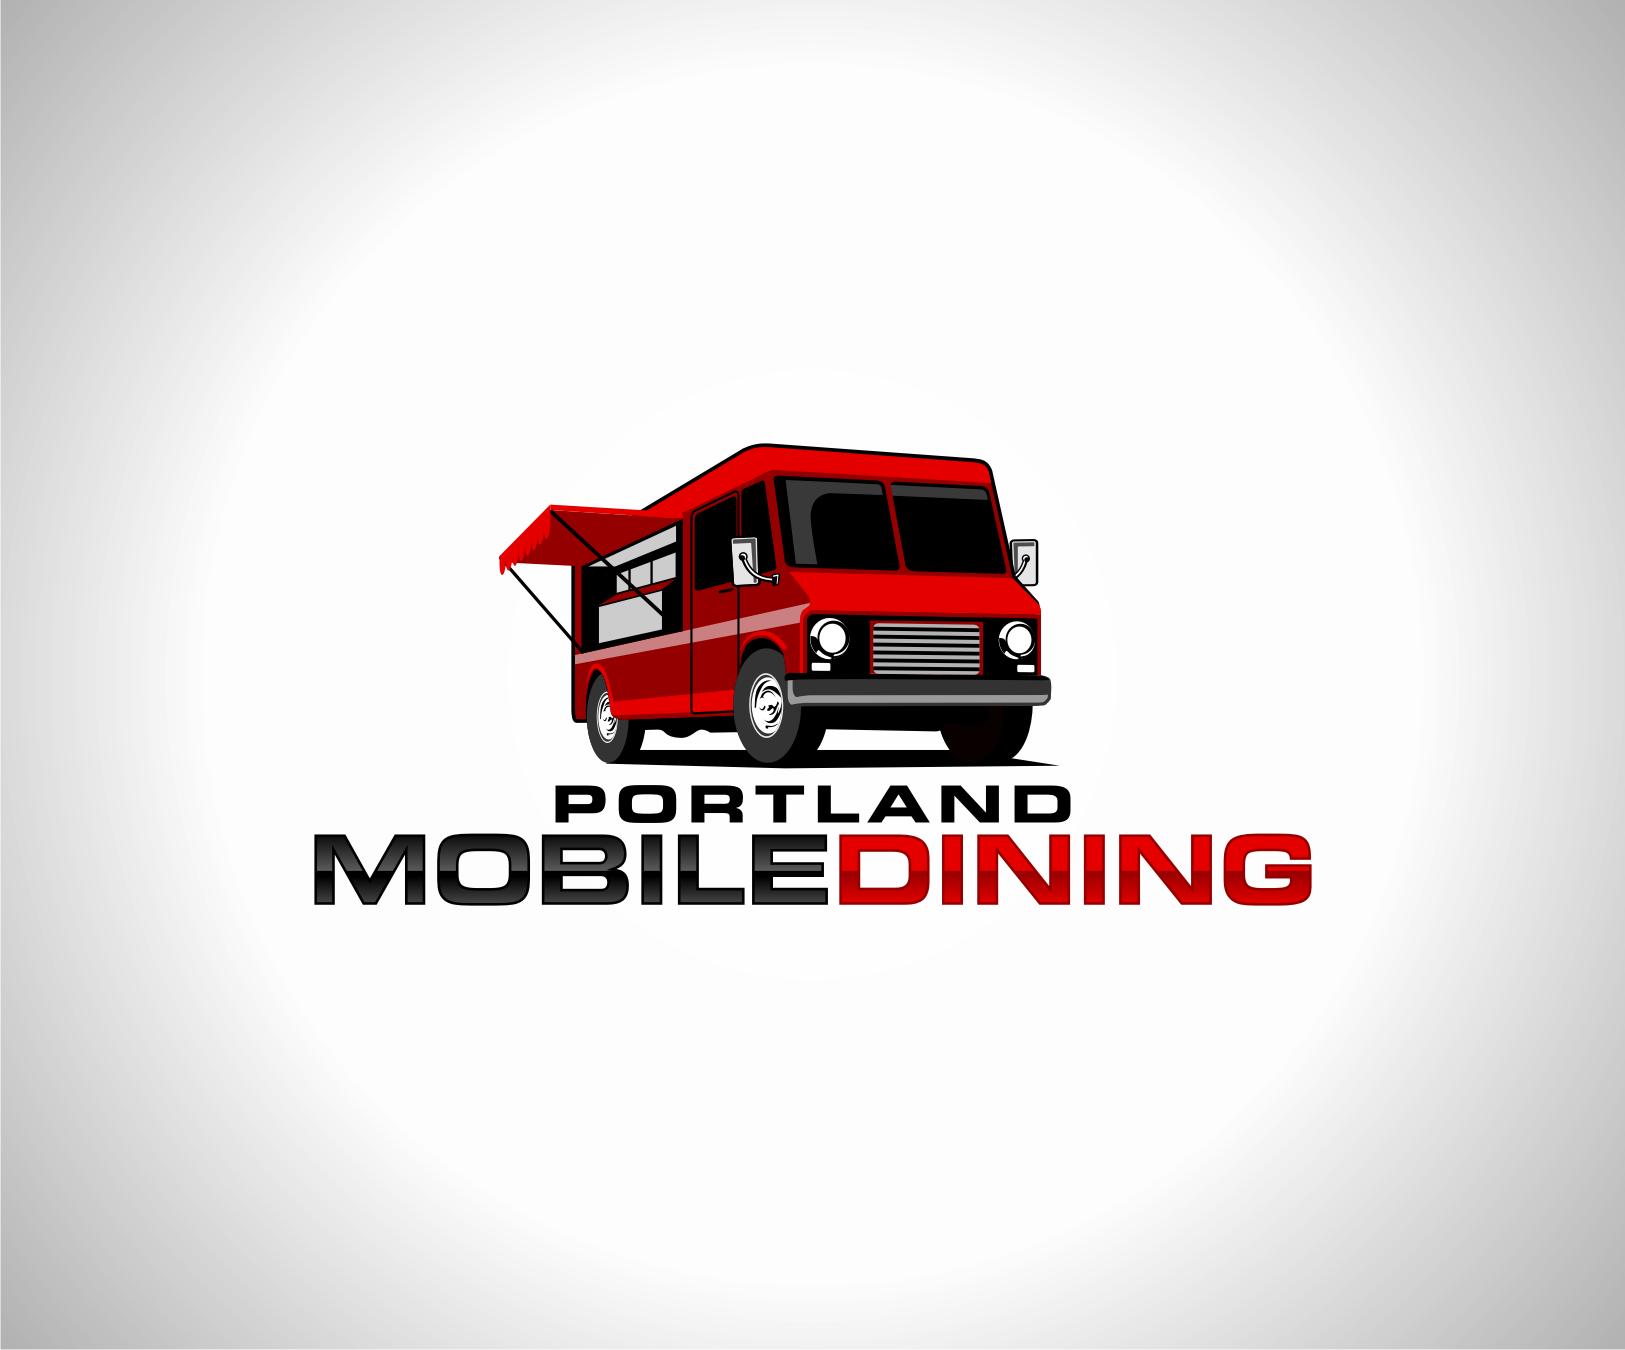 Food Cart Booking Agency Logo